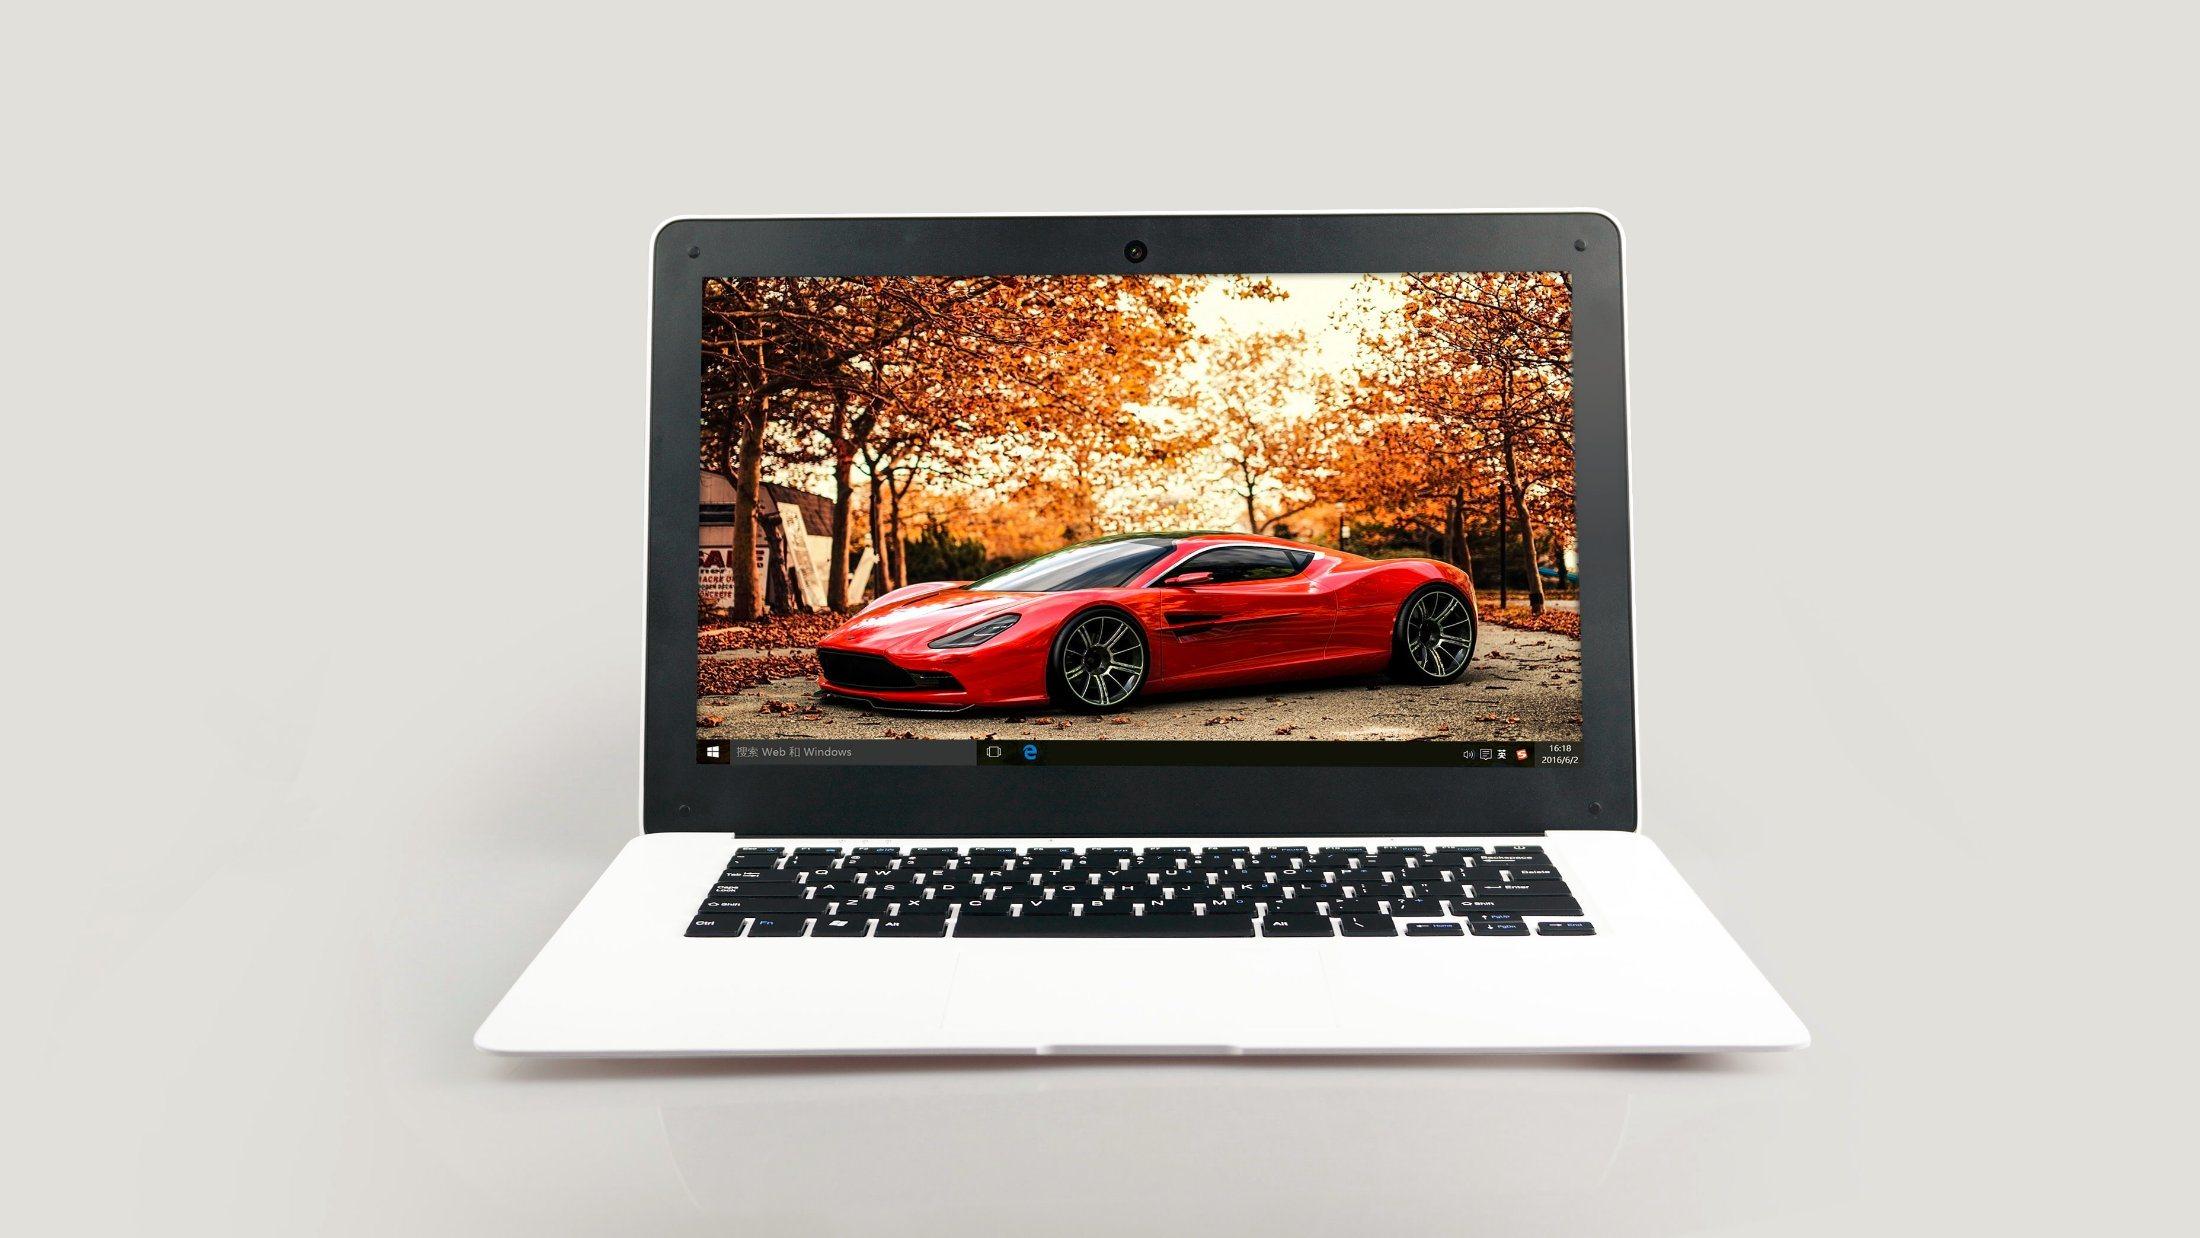 14 Inch Intel Z8350 Quad-Core Win 10 Laptop Computer